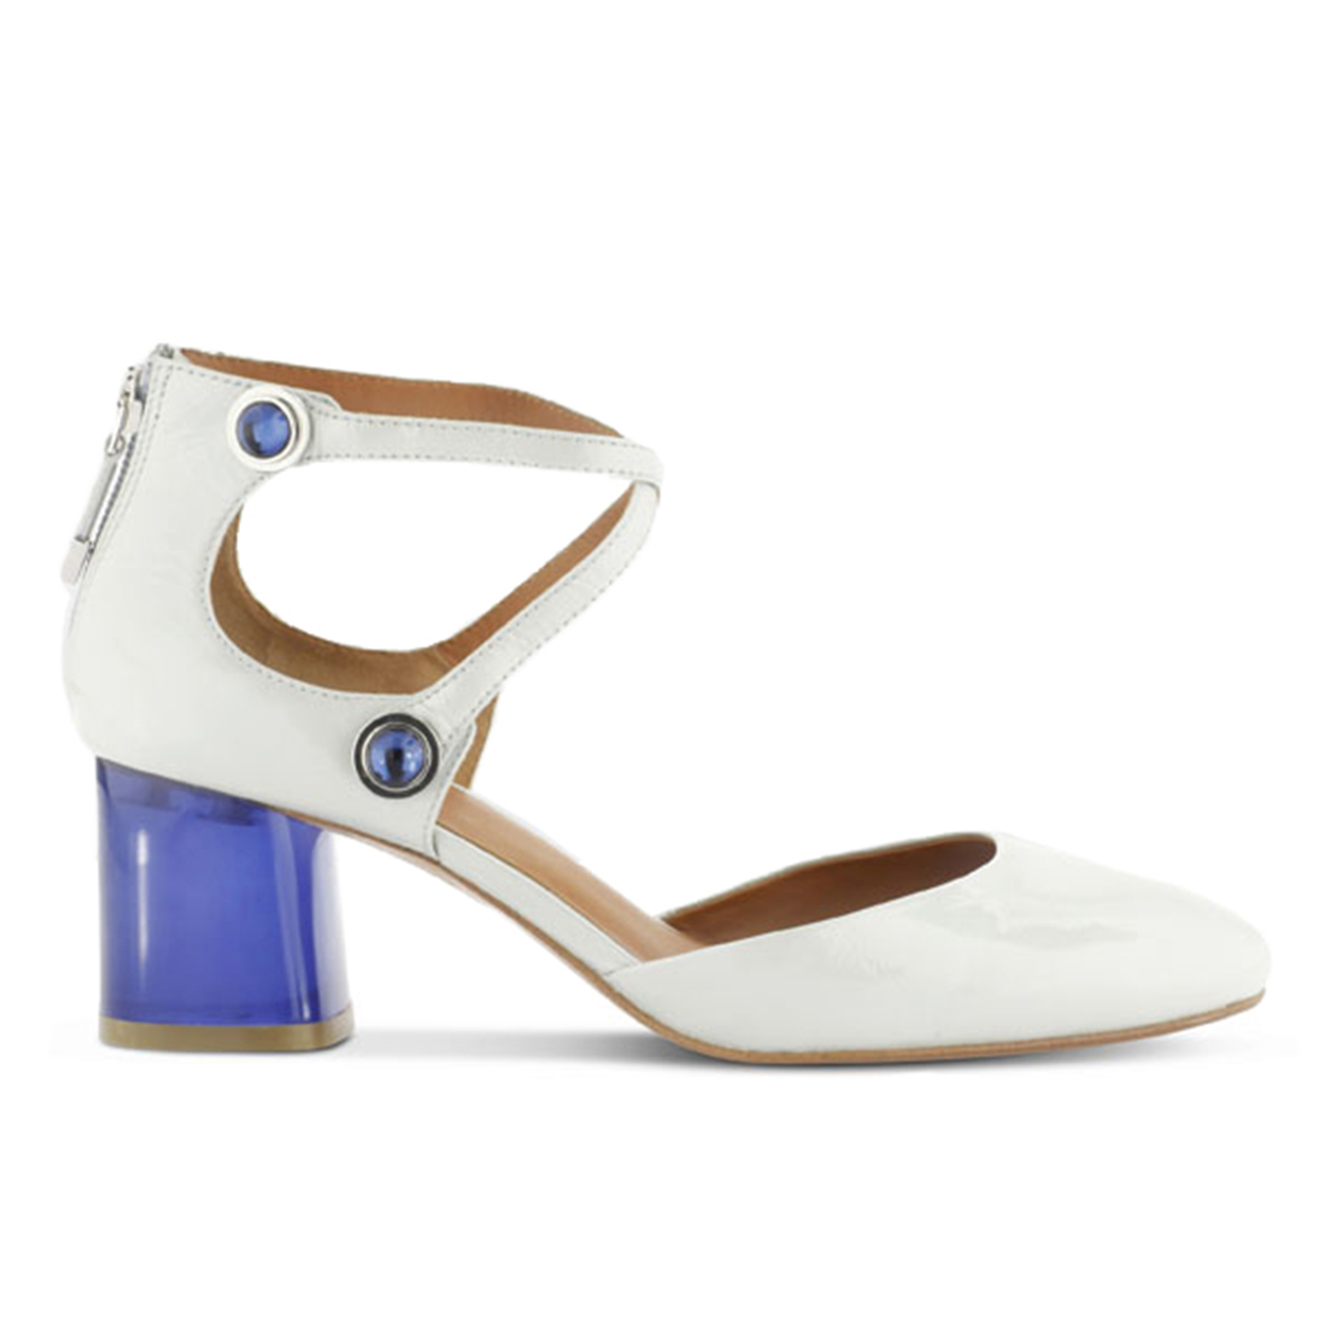 Sandales en Cuir Kim bleu/blanc - Talon 6 cm - What For - Modalova